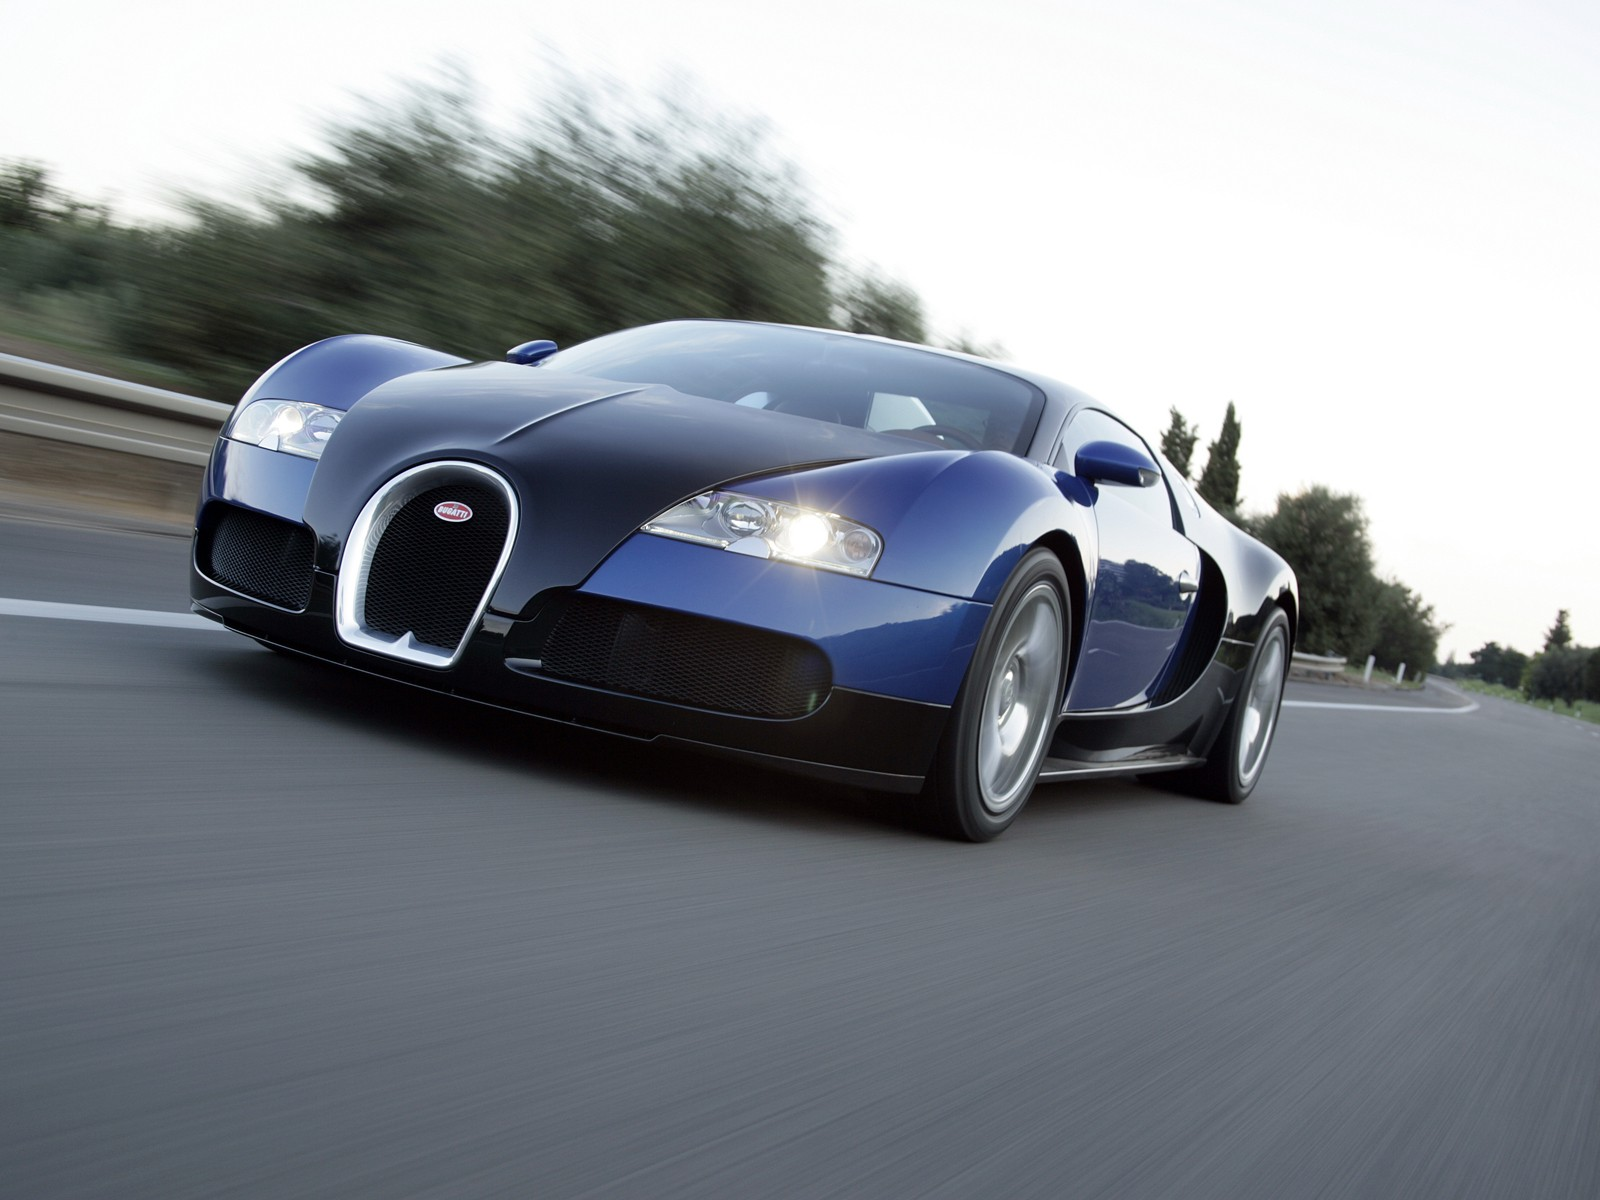 Bugatti-Veyron-53-JKT2G7XQKY-1600x1200 Inspiring Bugatti Veyron Quarter Mile Speed Cars Trend